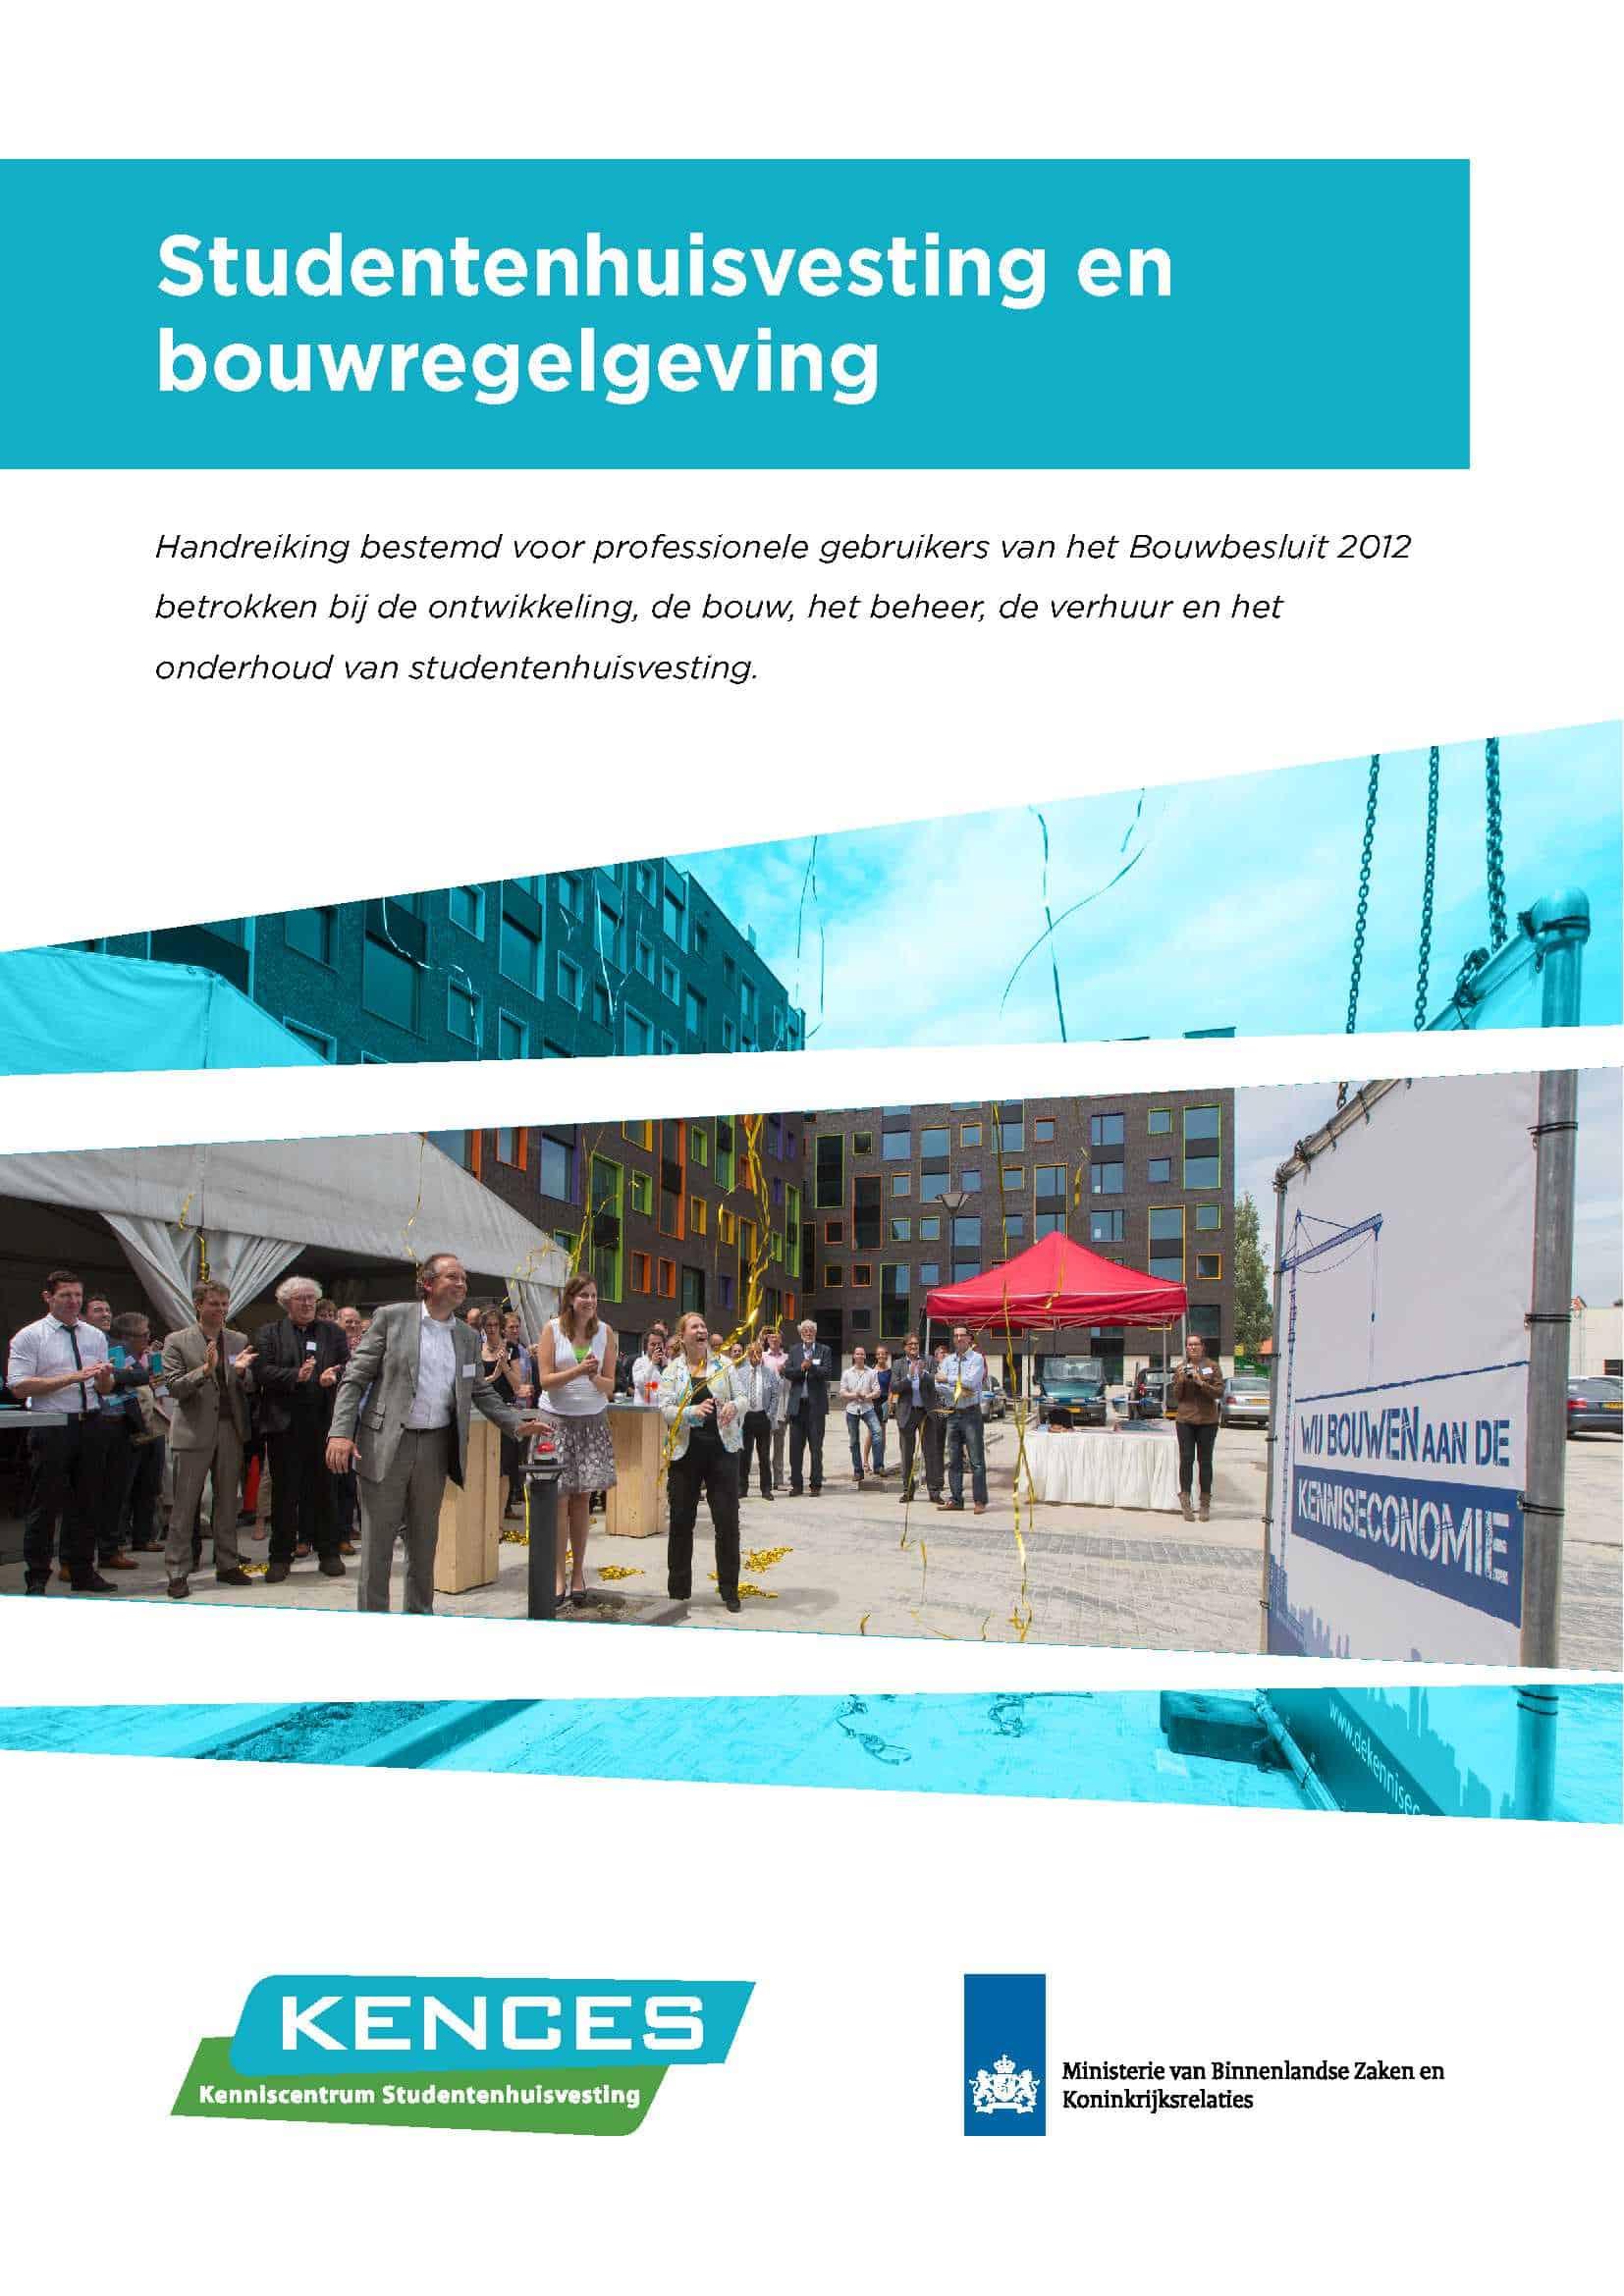 Studentenhuisvesting_en_bouwregelgeving_05092013_1